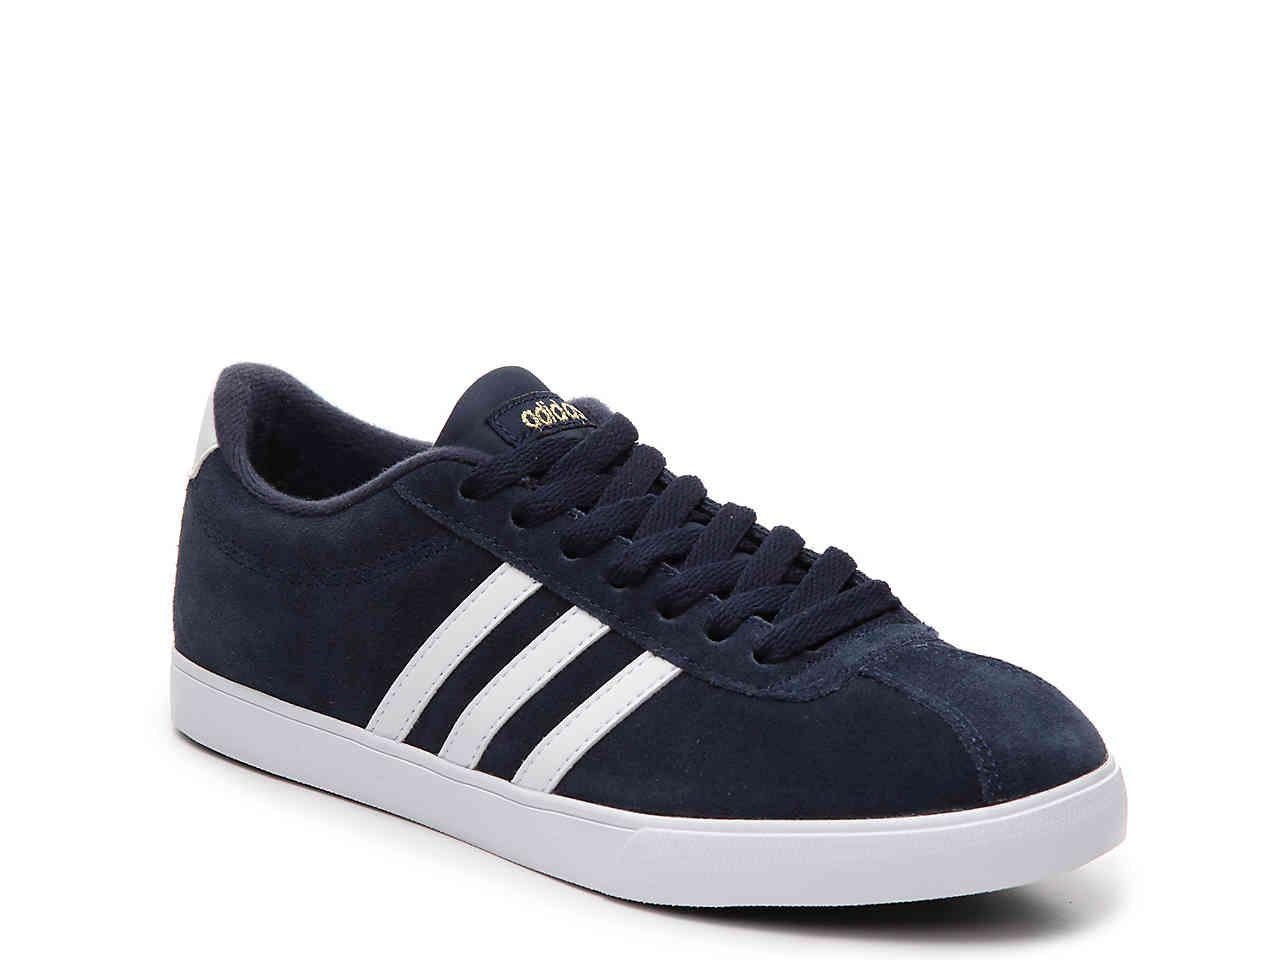 adidas Courtset Sneaker - Women's | Sneakers, Adidas ...